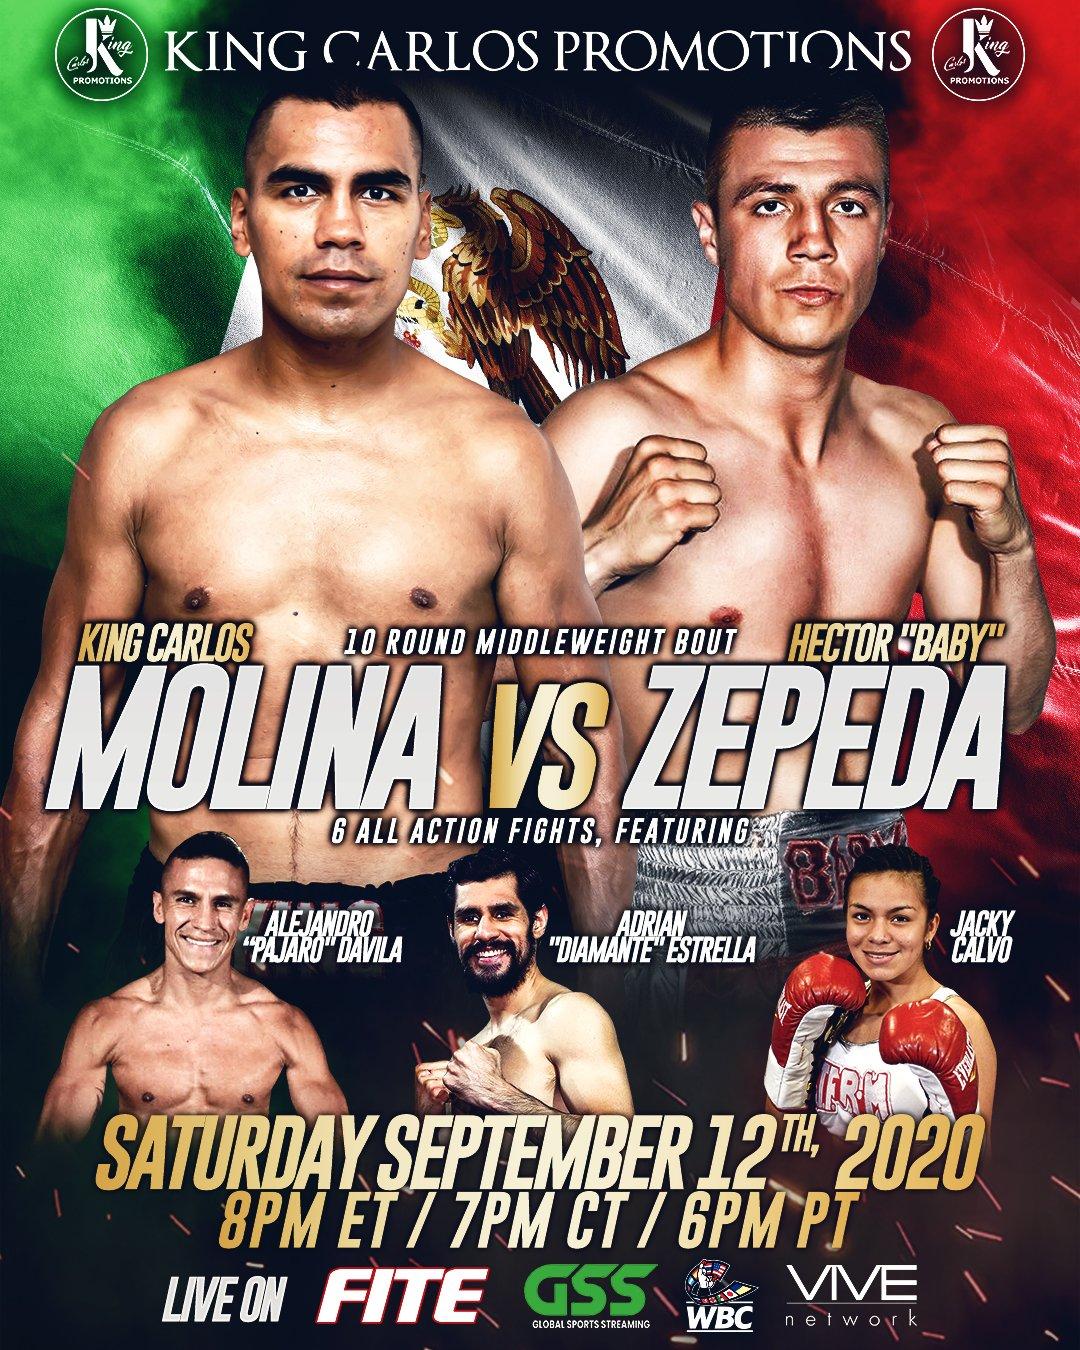 http://suljosblog.com/suljos/wp-content/uploads/2020/09/Molina_vs_Zepeda_with_Undercard-1.jpg